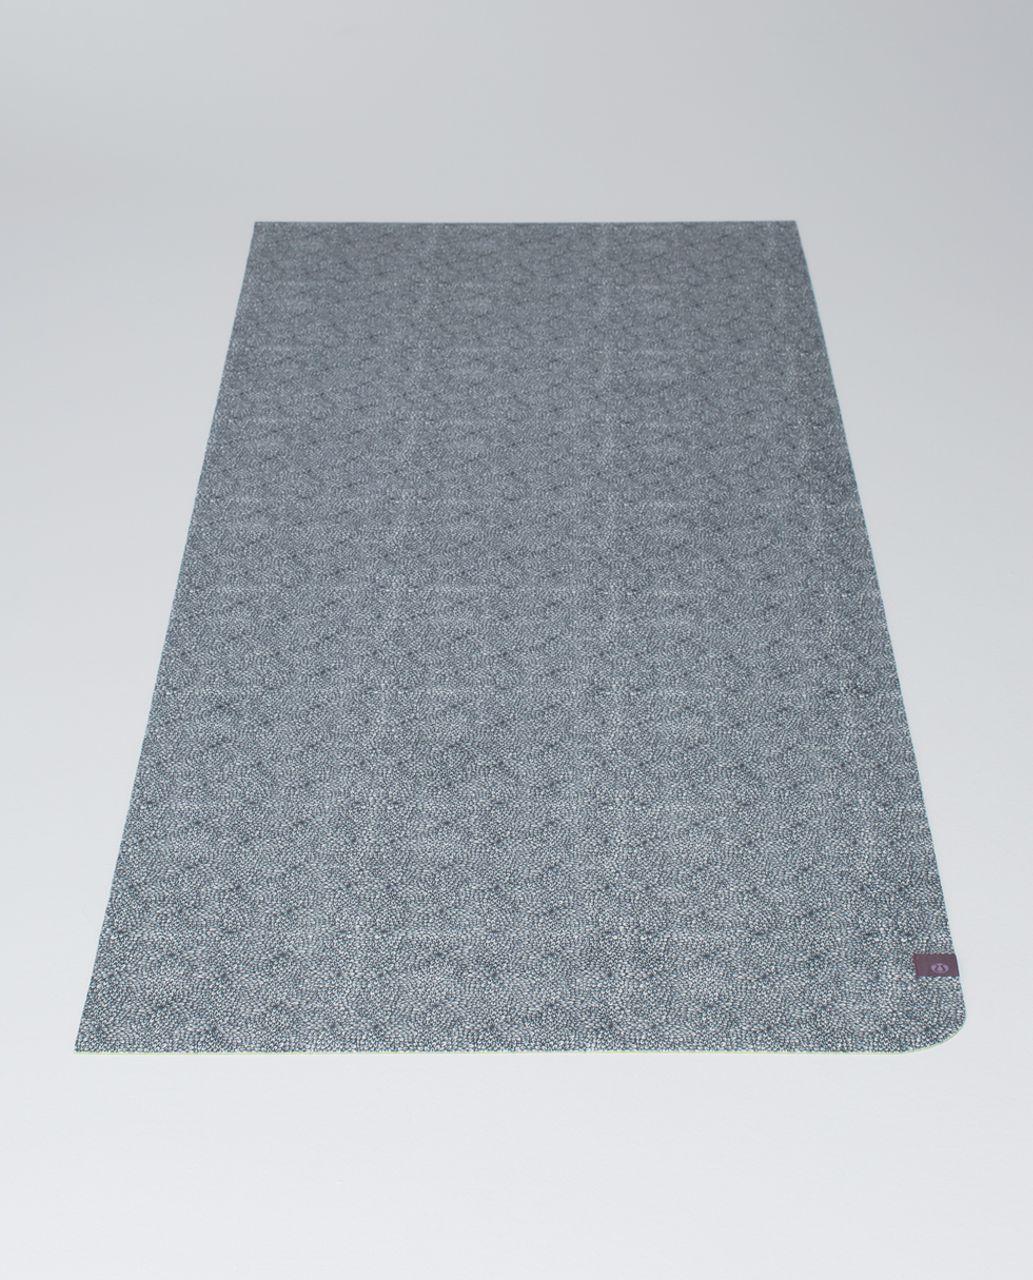 42ba8ab526 Lululemon The Hot (Towel) Mat - Plush Petal Black Ghost / Almost Pear